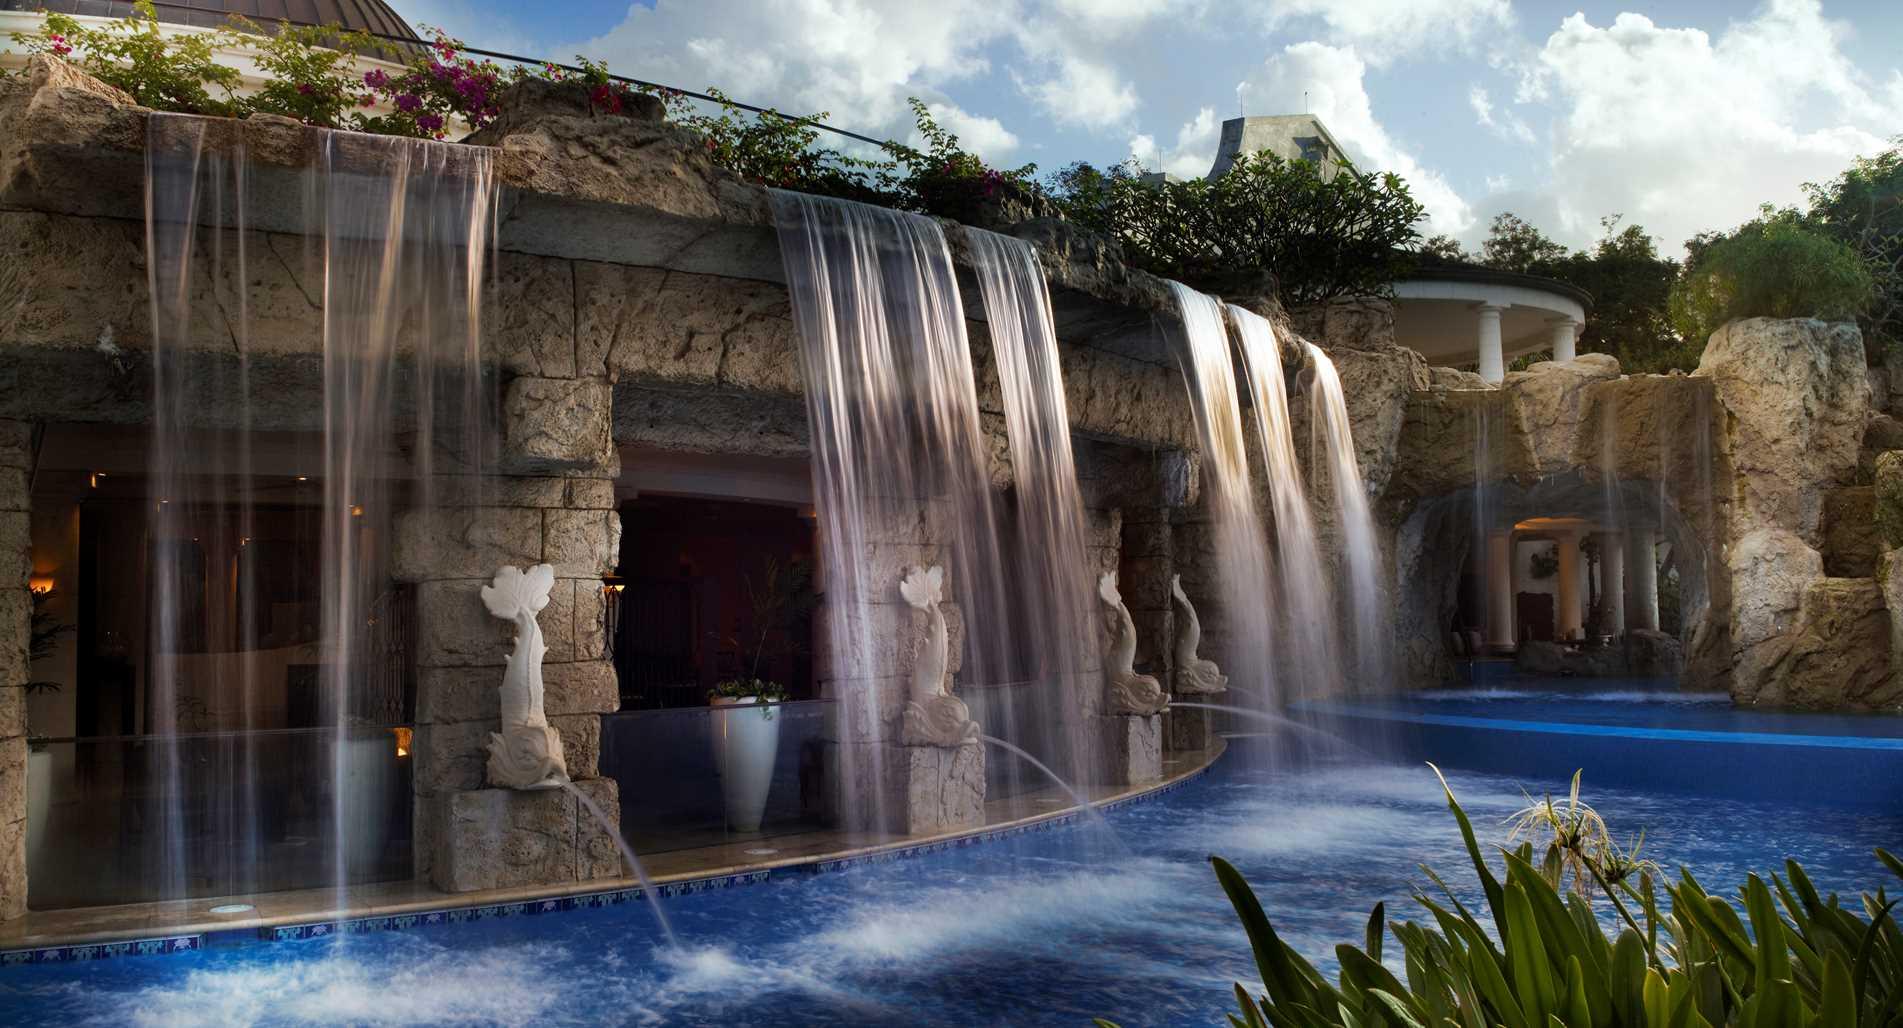 Barbados_Sandy-Lane_Waterfall-at-The-Spa.jpeg